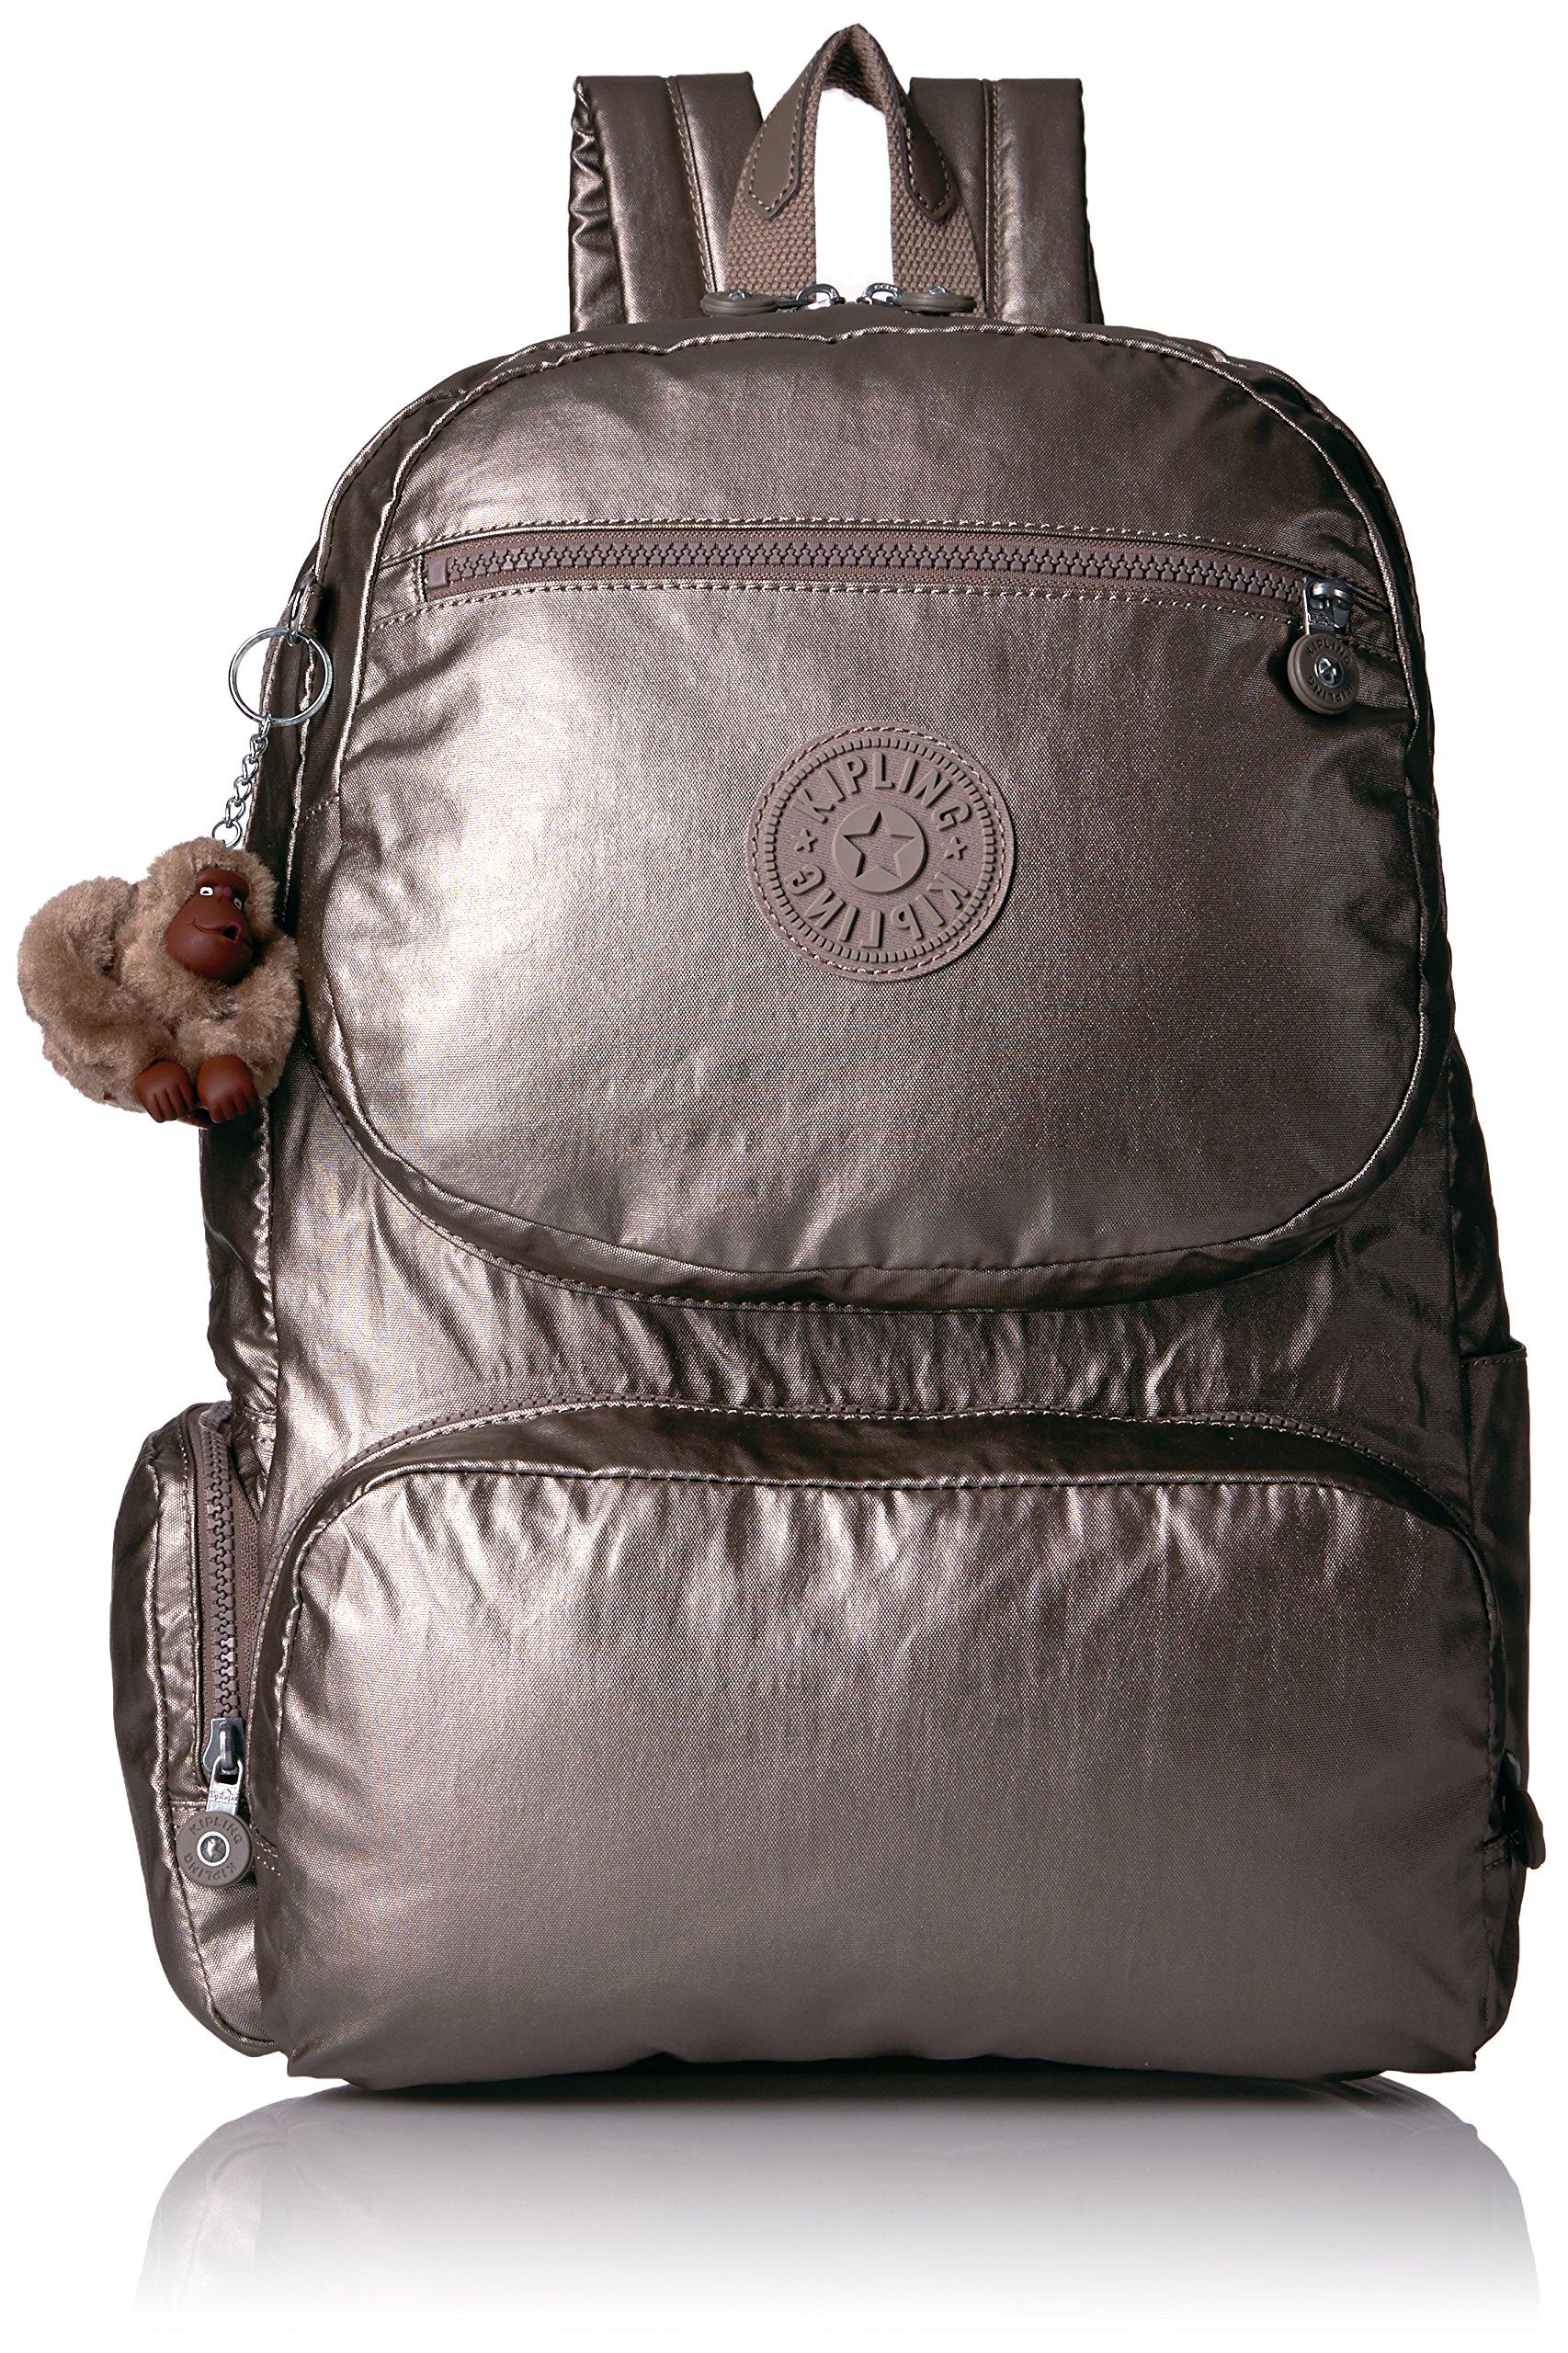 Kipling Women's Dawson Metallic Travel Backpack